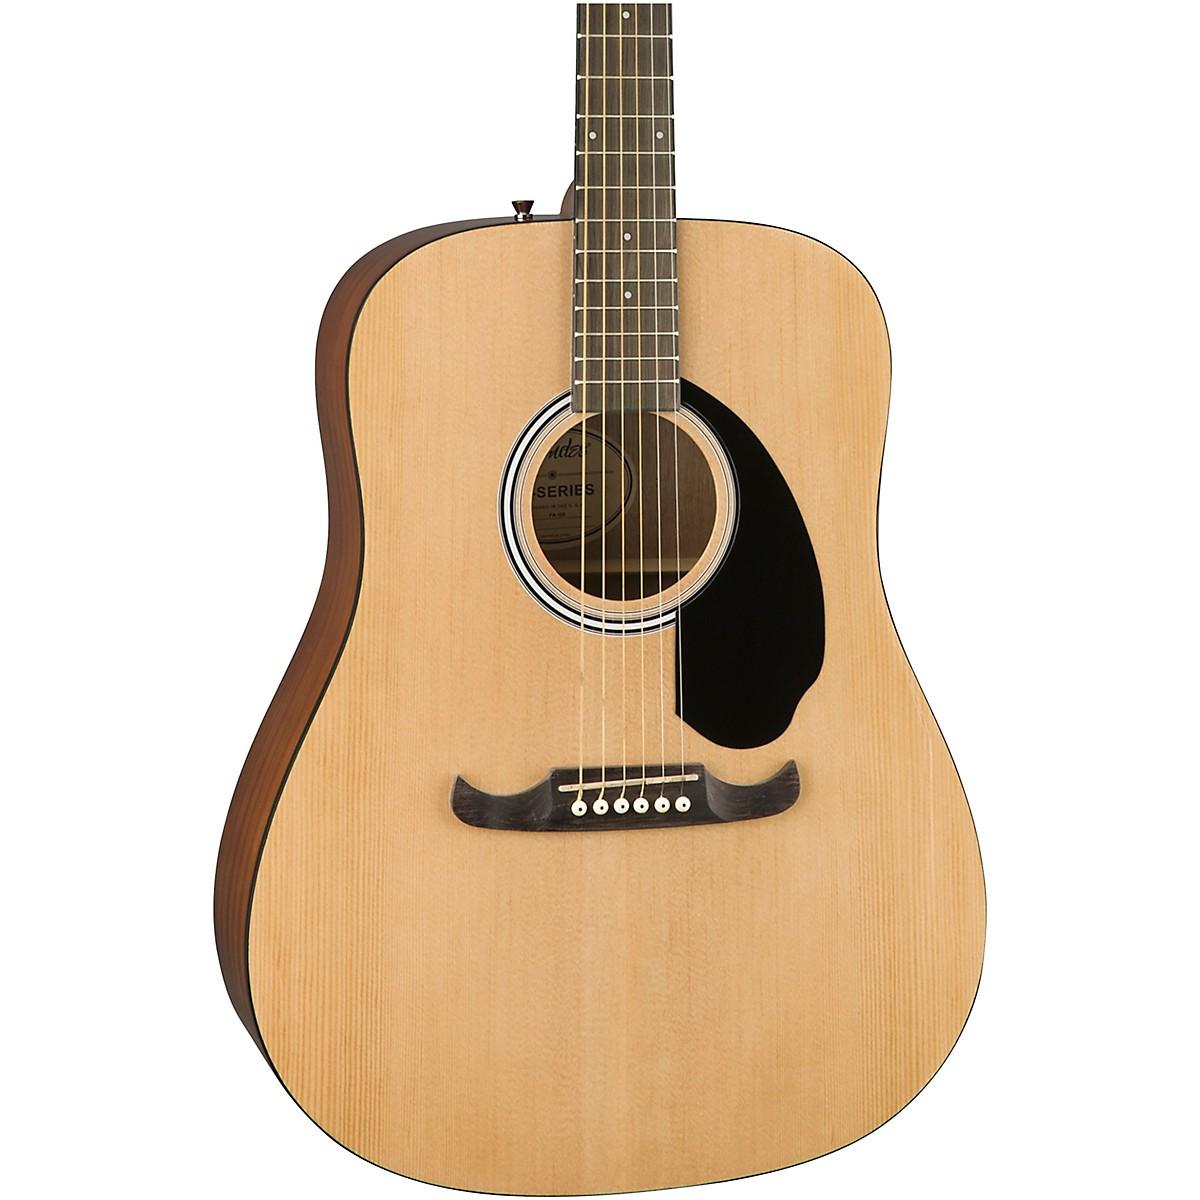 Fender FA-125 Dreadnought Acoustic Guitar